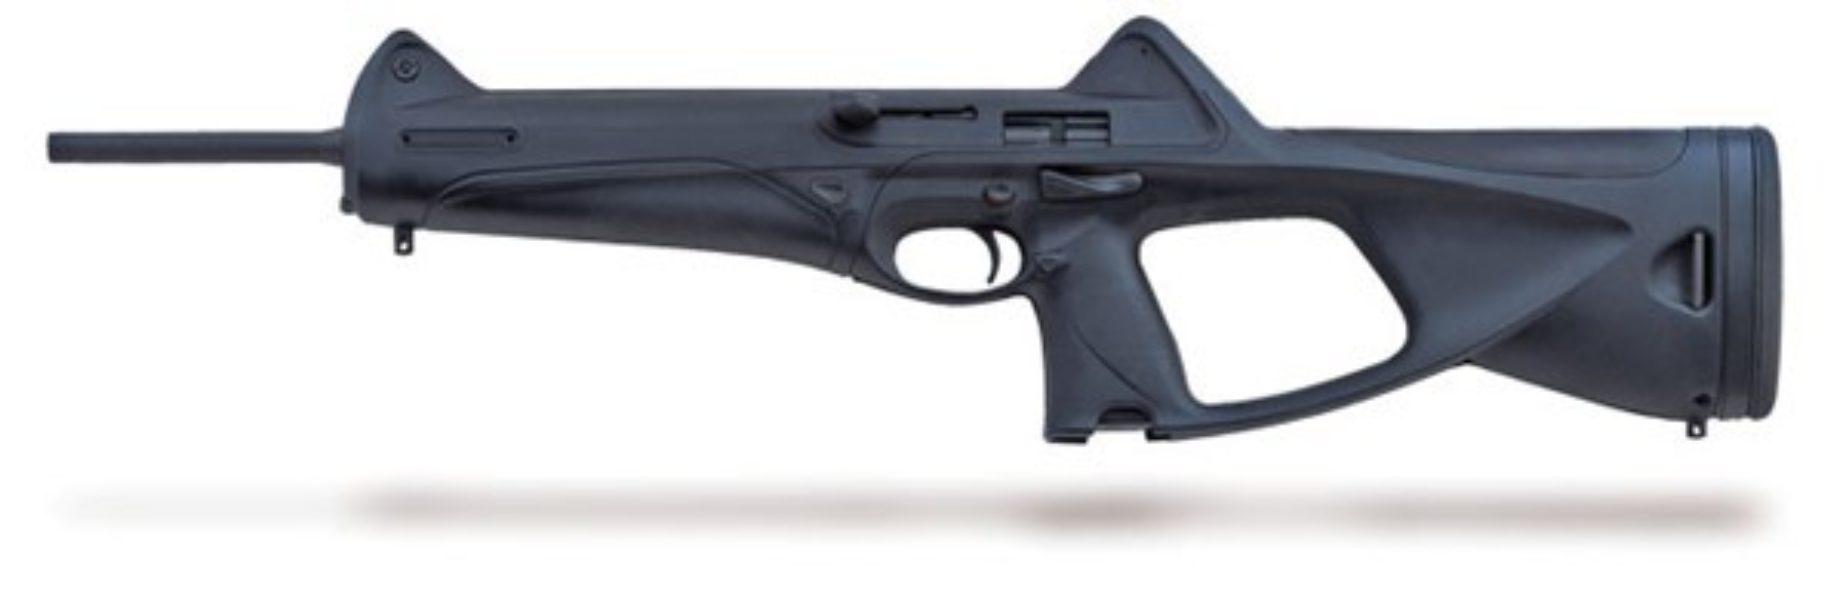 Beretta cx4 storm kal 9mm